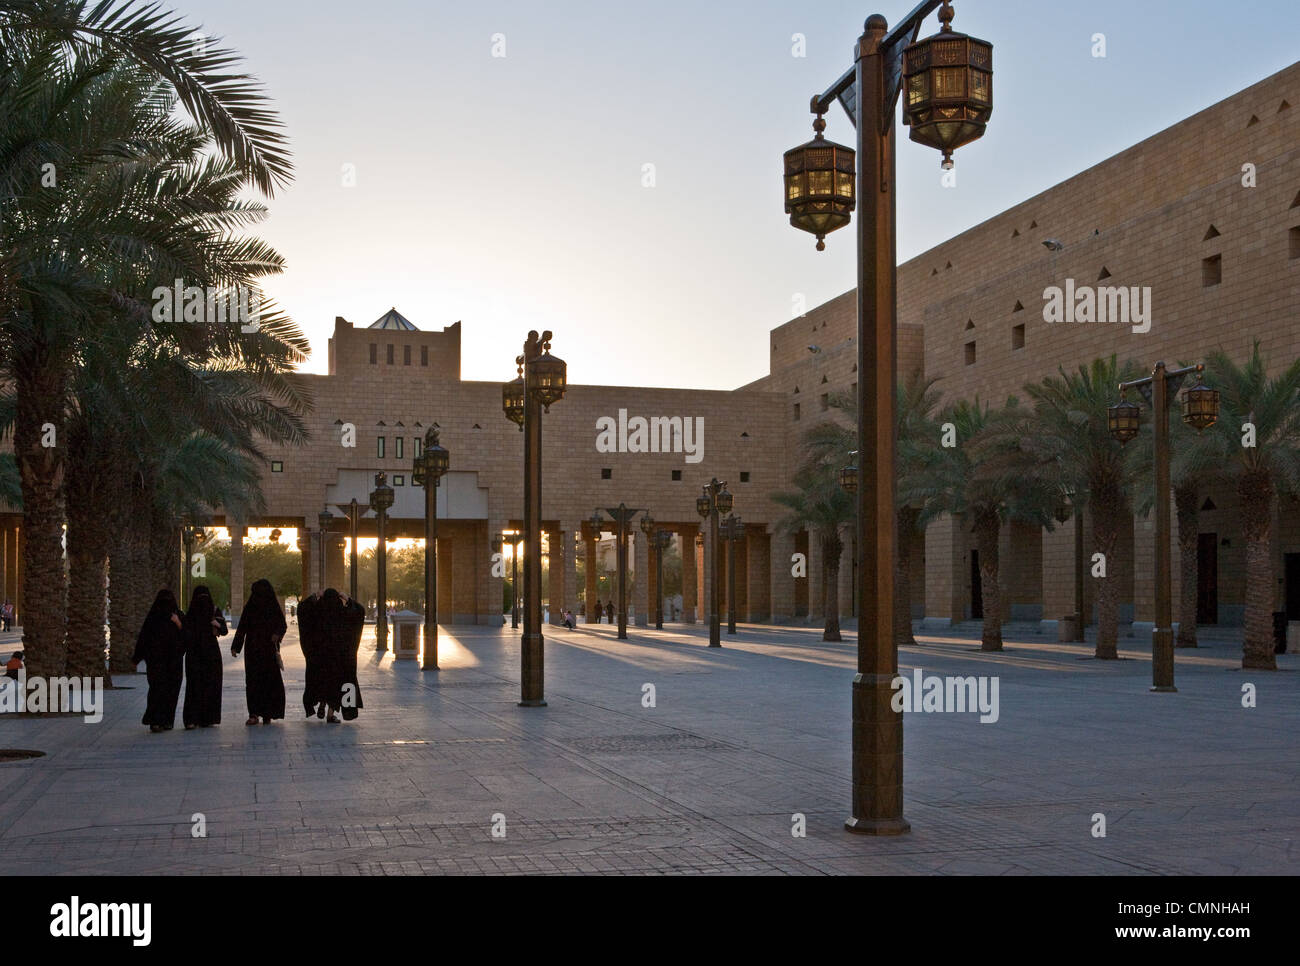 Asie Arabie Saoudite Riyad, la racine carrée du quartier Al Bathaa Photo Stock